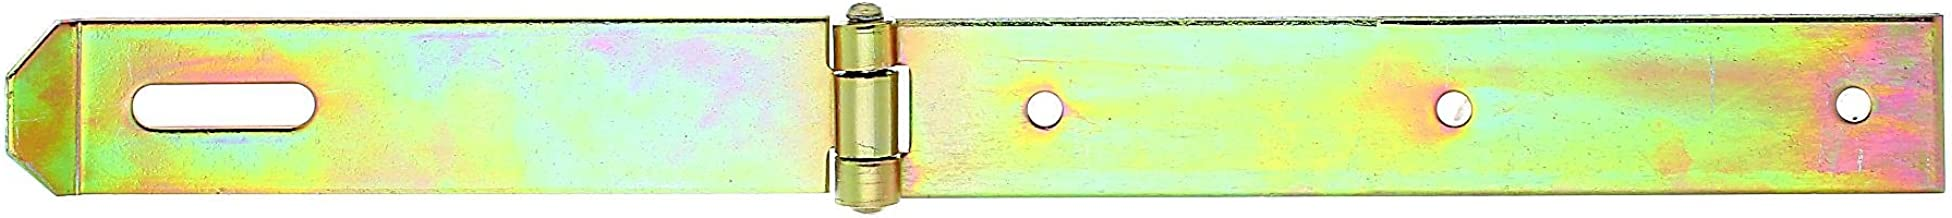 Overval, geel verzinkt 167 x 35 x 210 mm